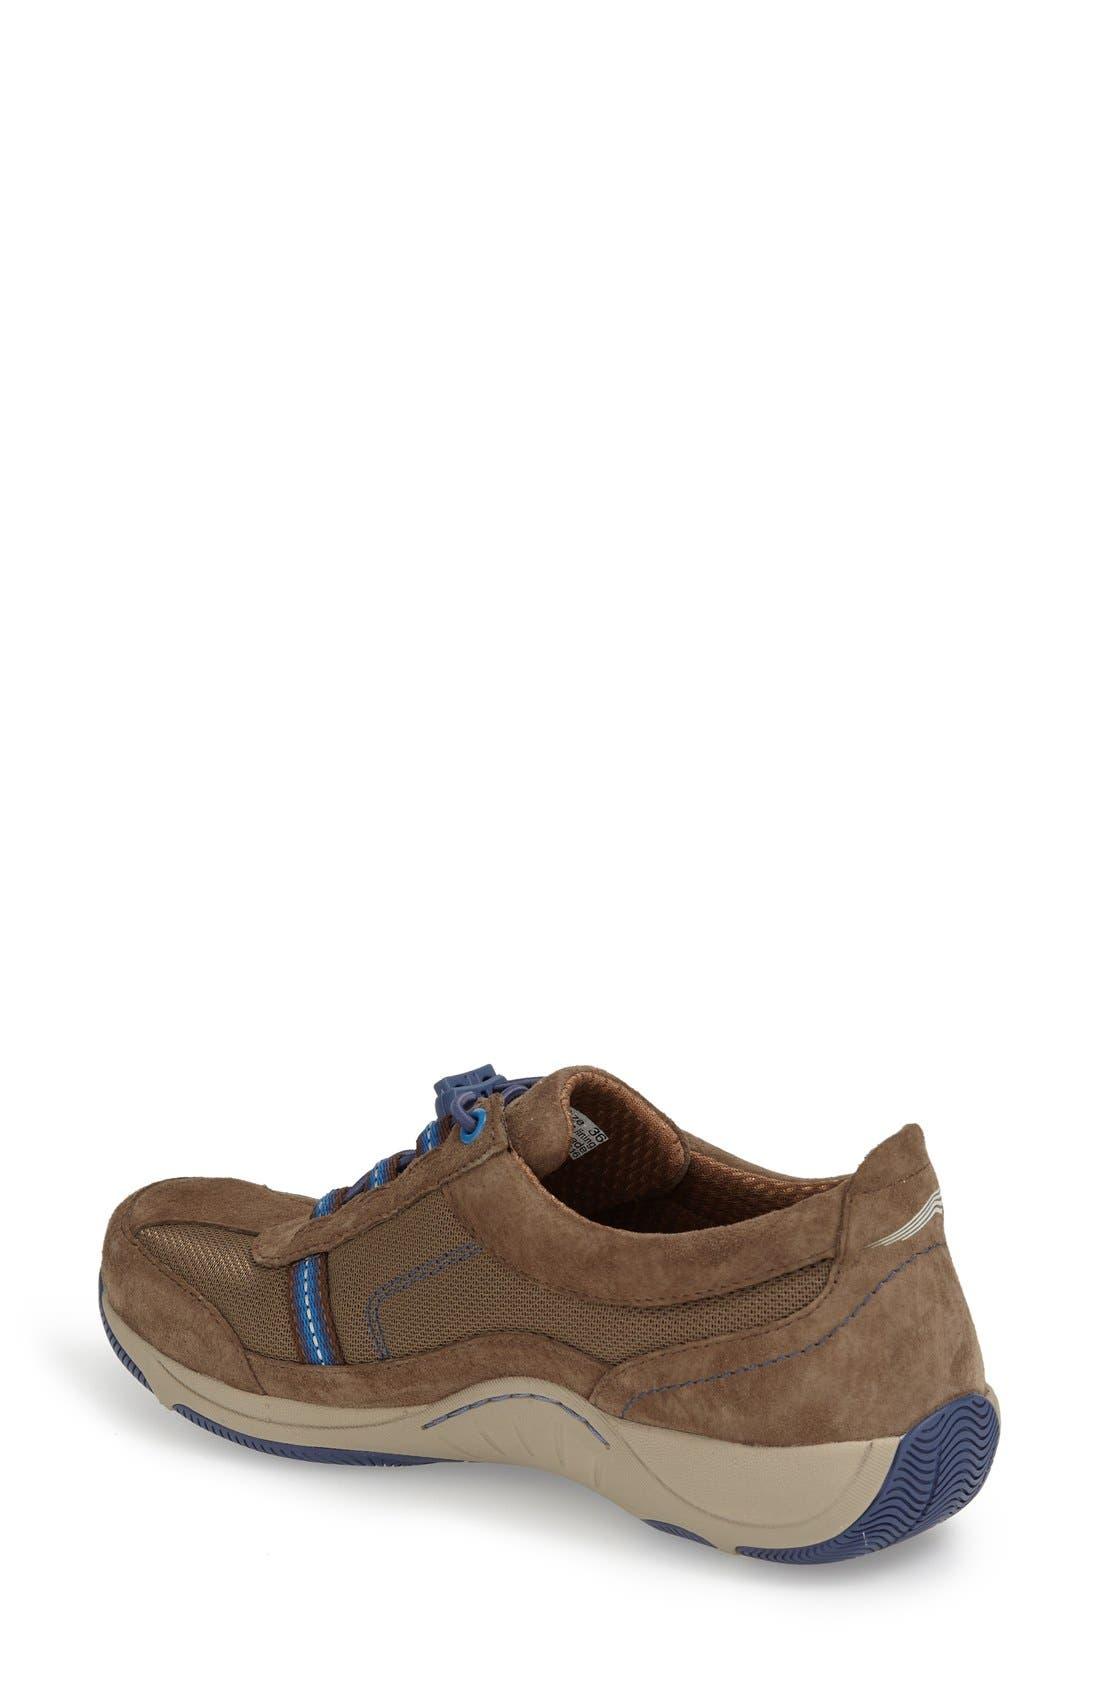 'Helen' Suede & Mesh Sneaker,                             Alternate thumbnail 25, color,